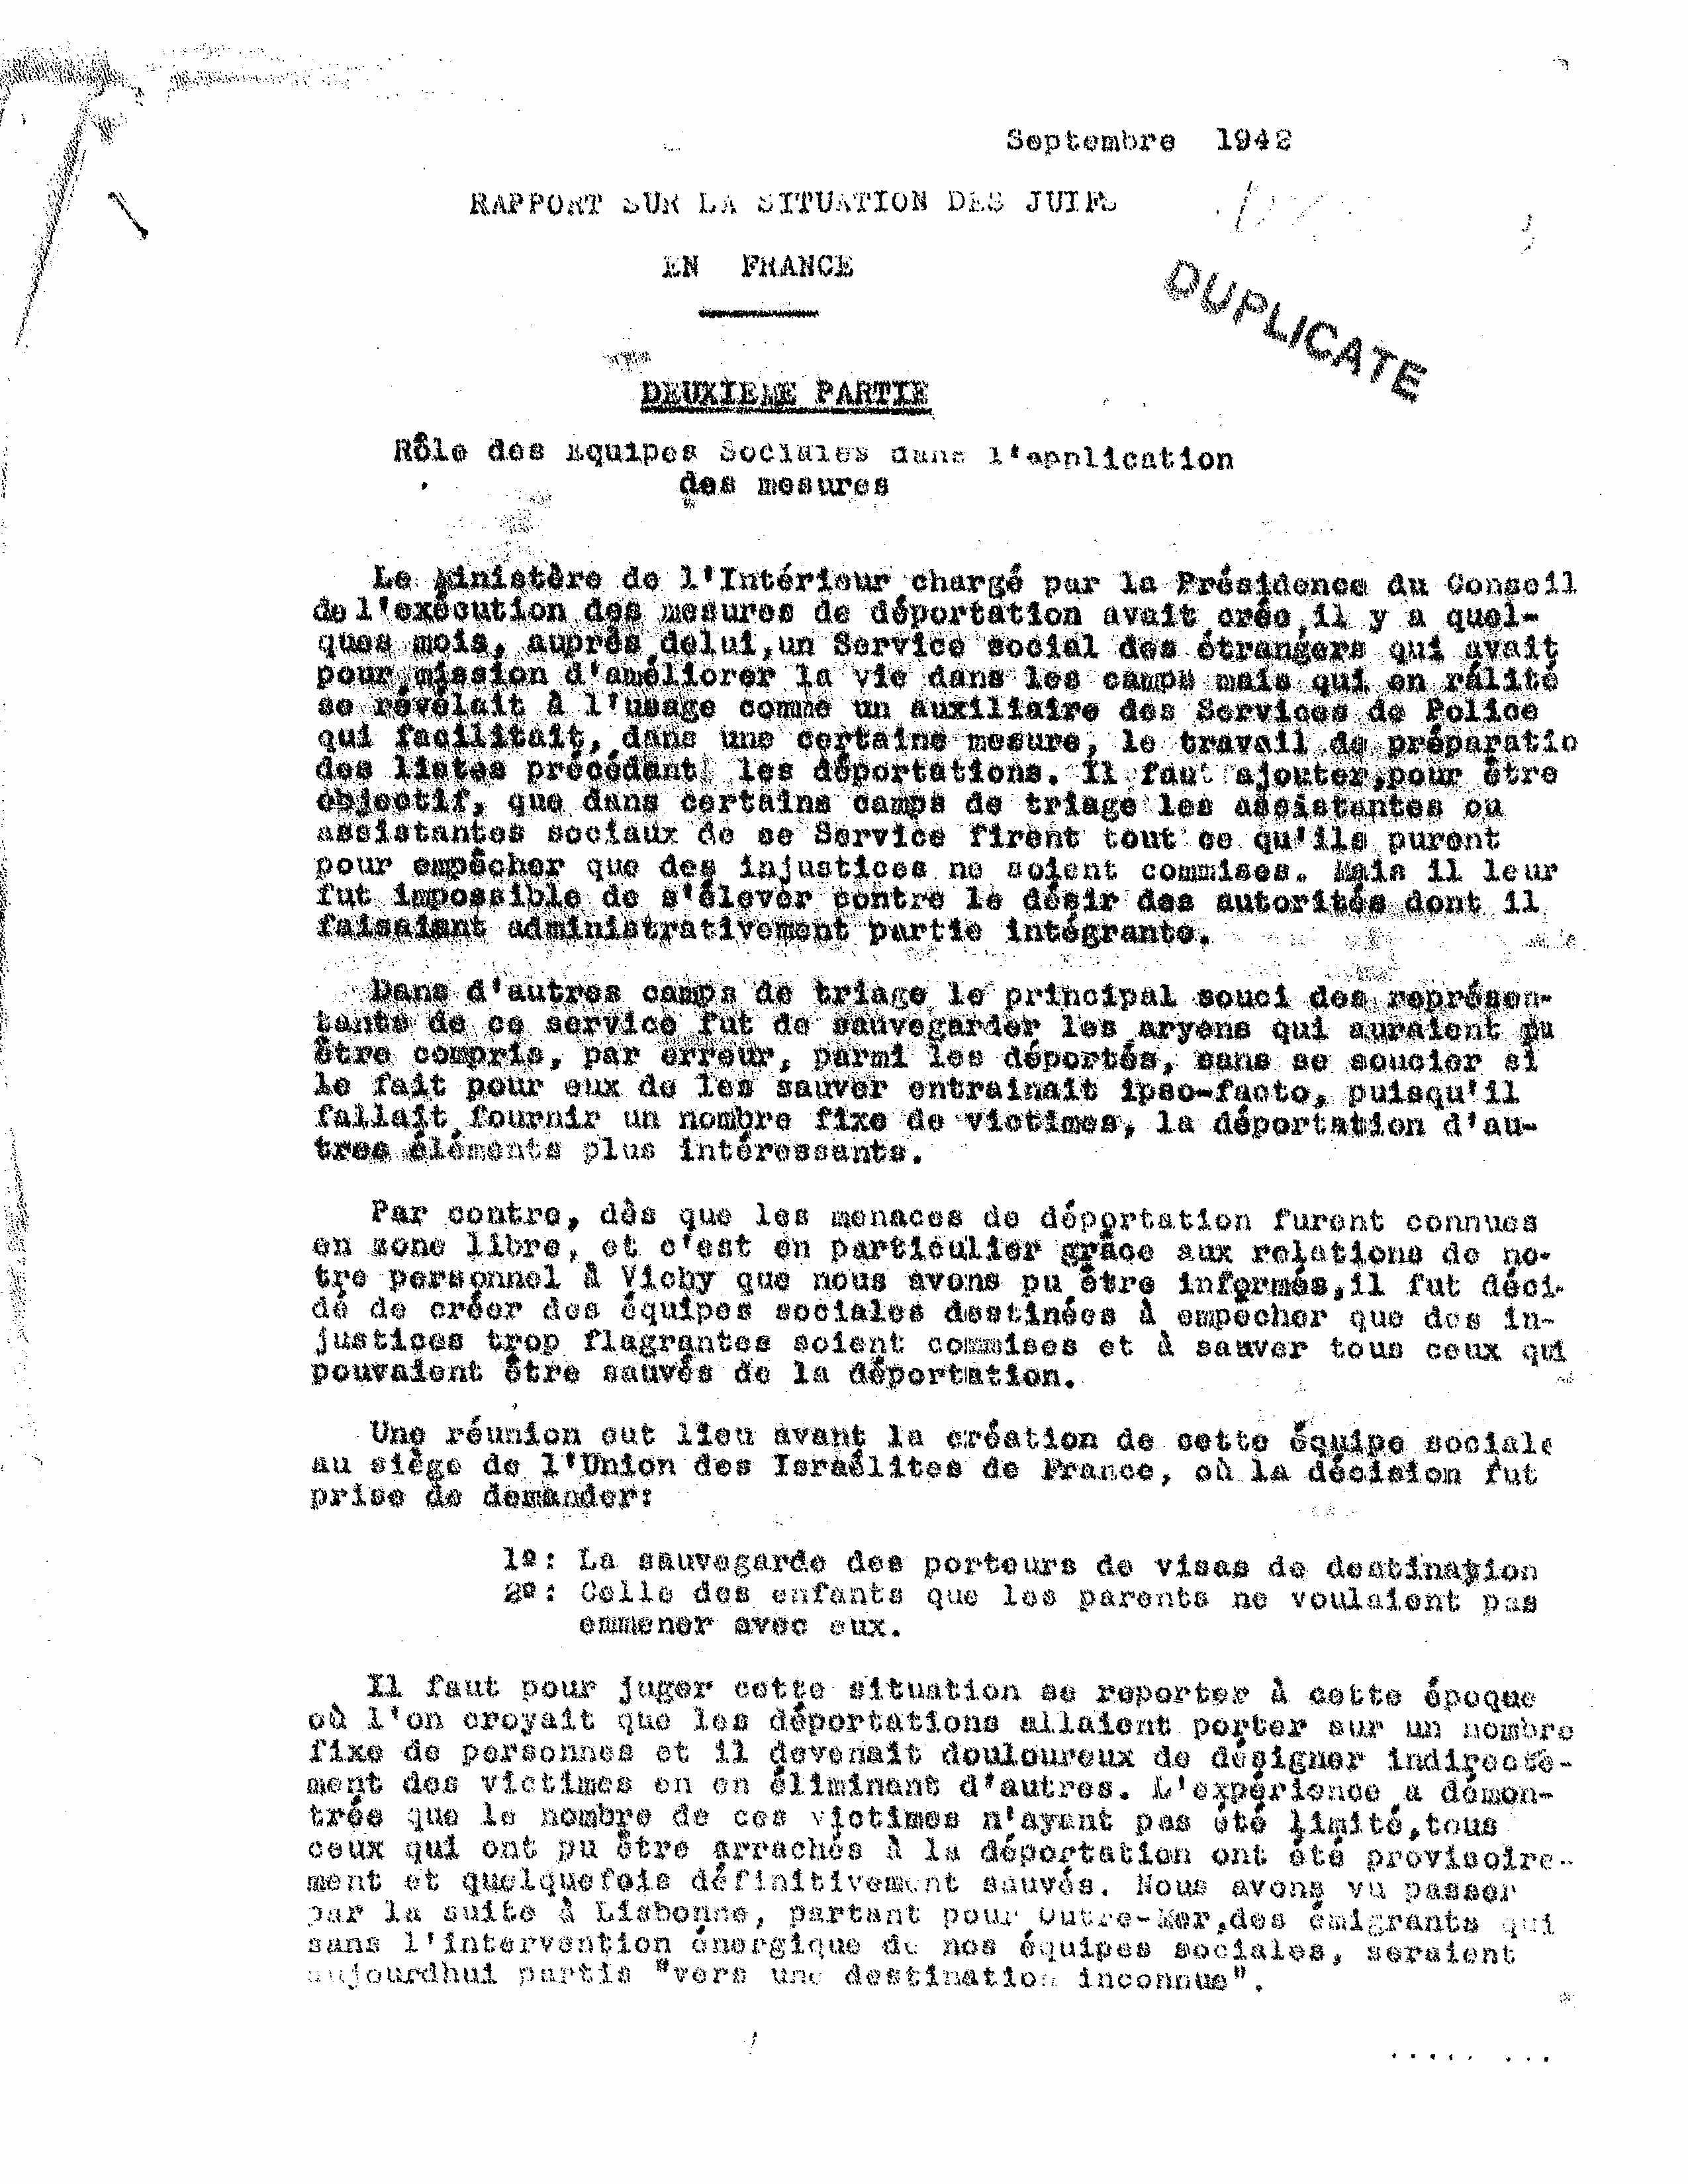 UGIF report 1942